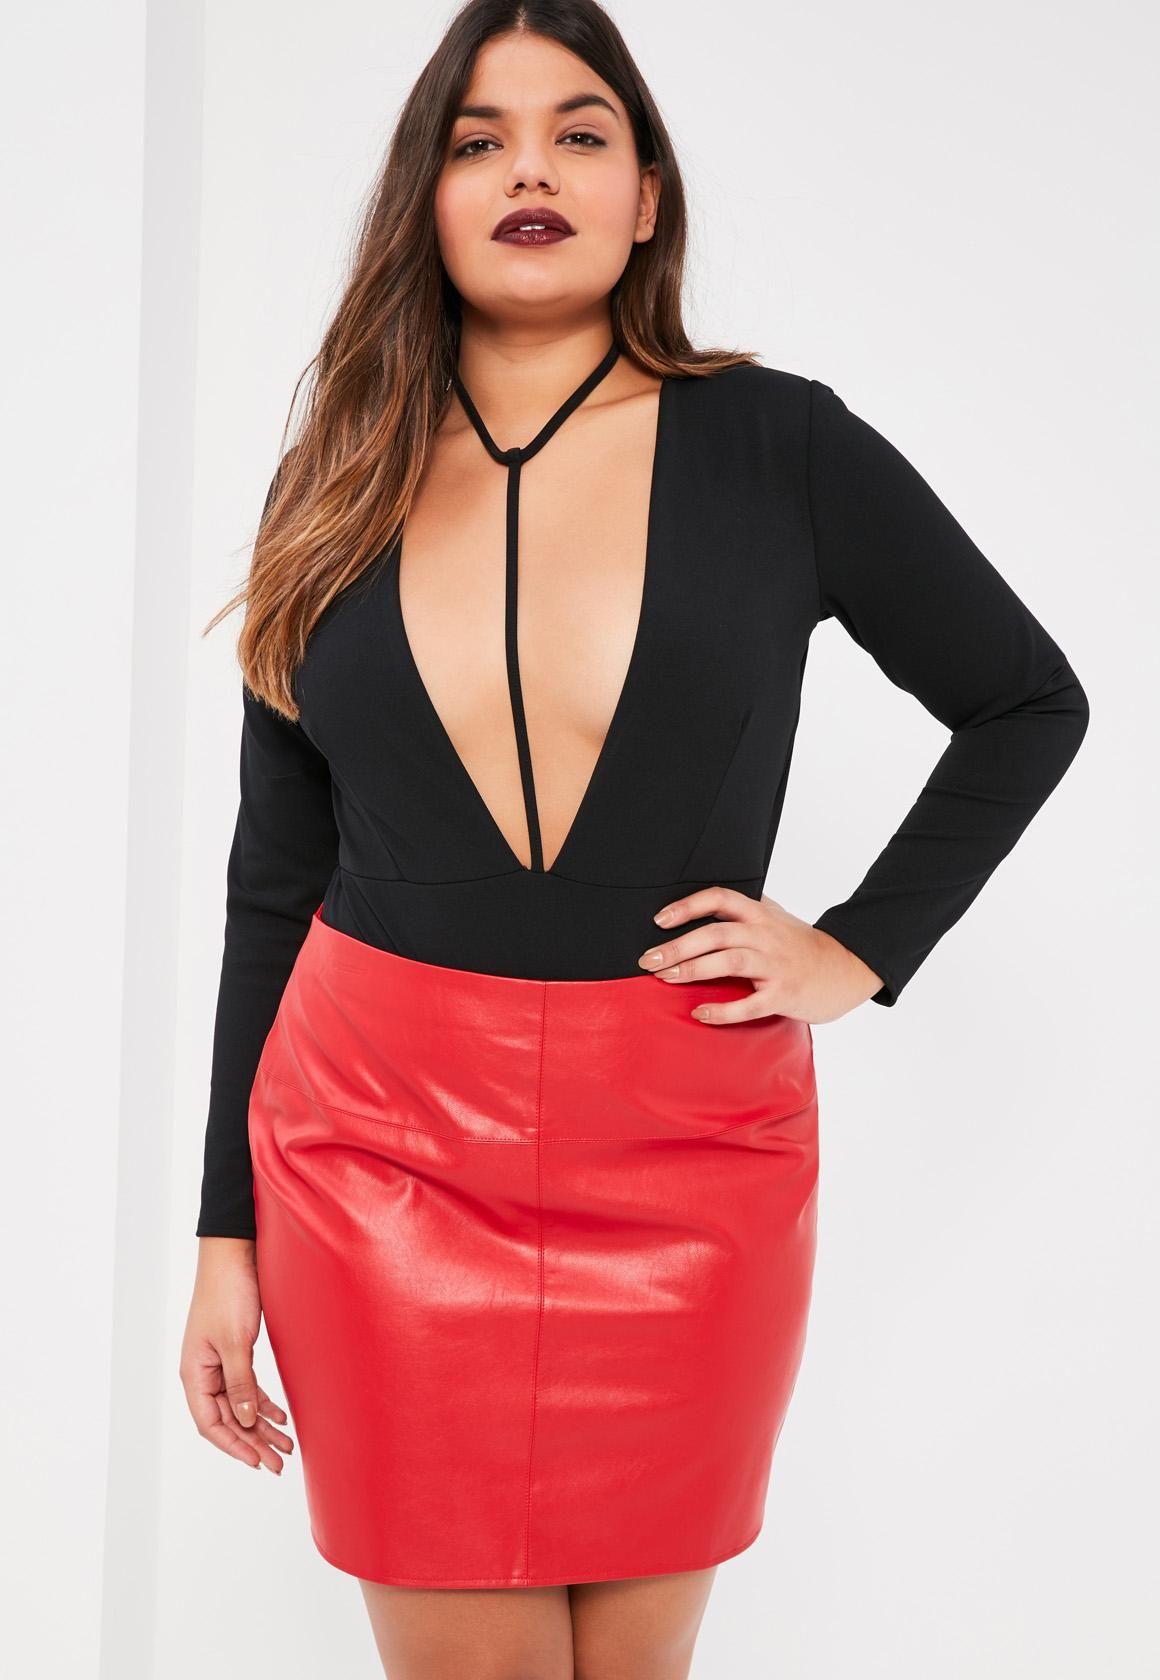 Missguided - Plus Size Black Harness Plunge Bodysuit | Clothes ...